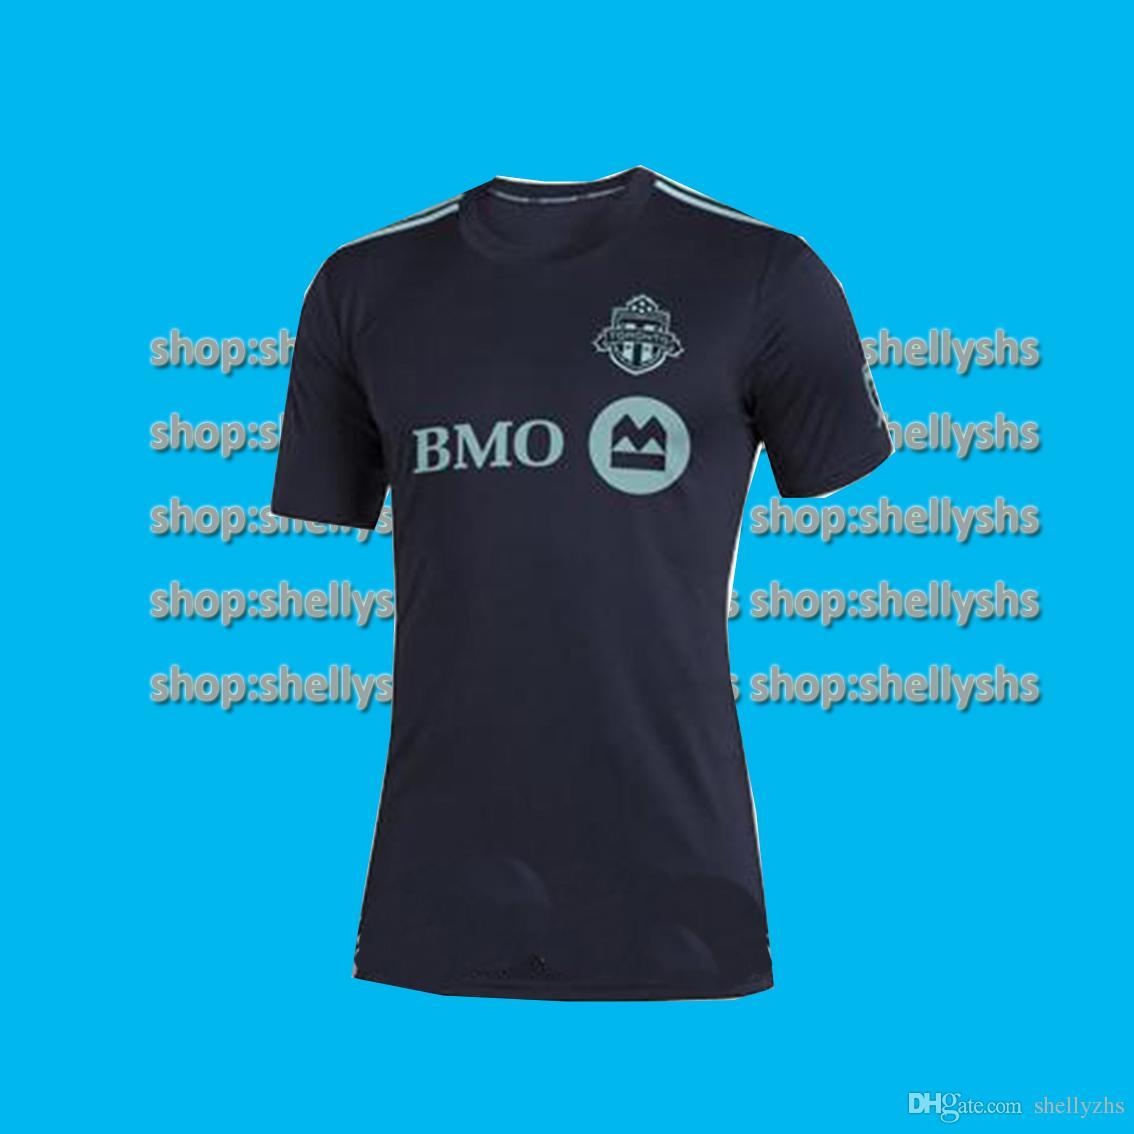 609b5affb6c 2019 MLS Toronto FC 2019 Parley Jersey 2019 2020 Parley MLS Toronto FC Men  Soccer Jersey 19 20 MLS Toronto FC Women Parley Jerseys From Shellyzhs